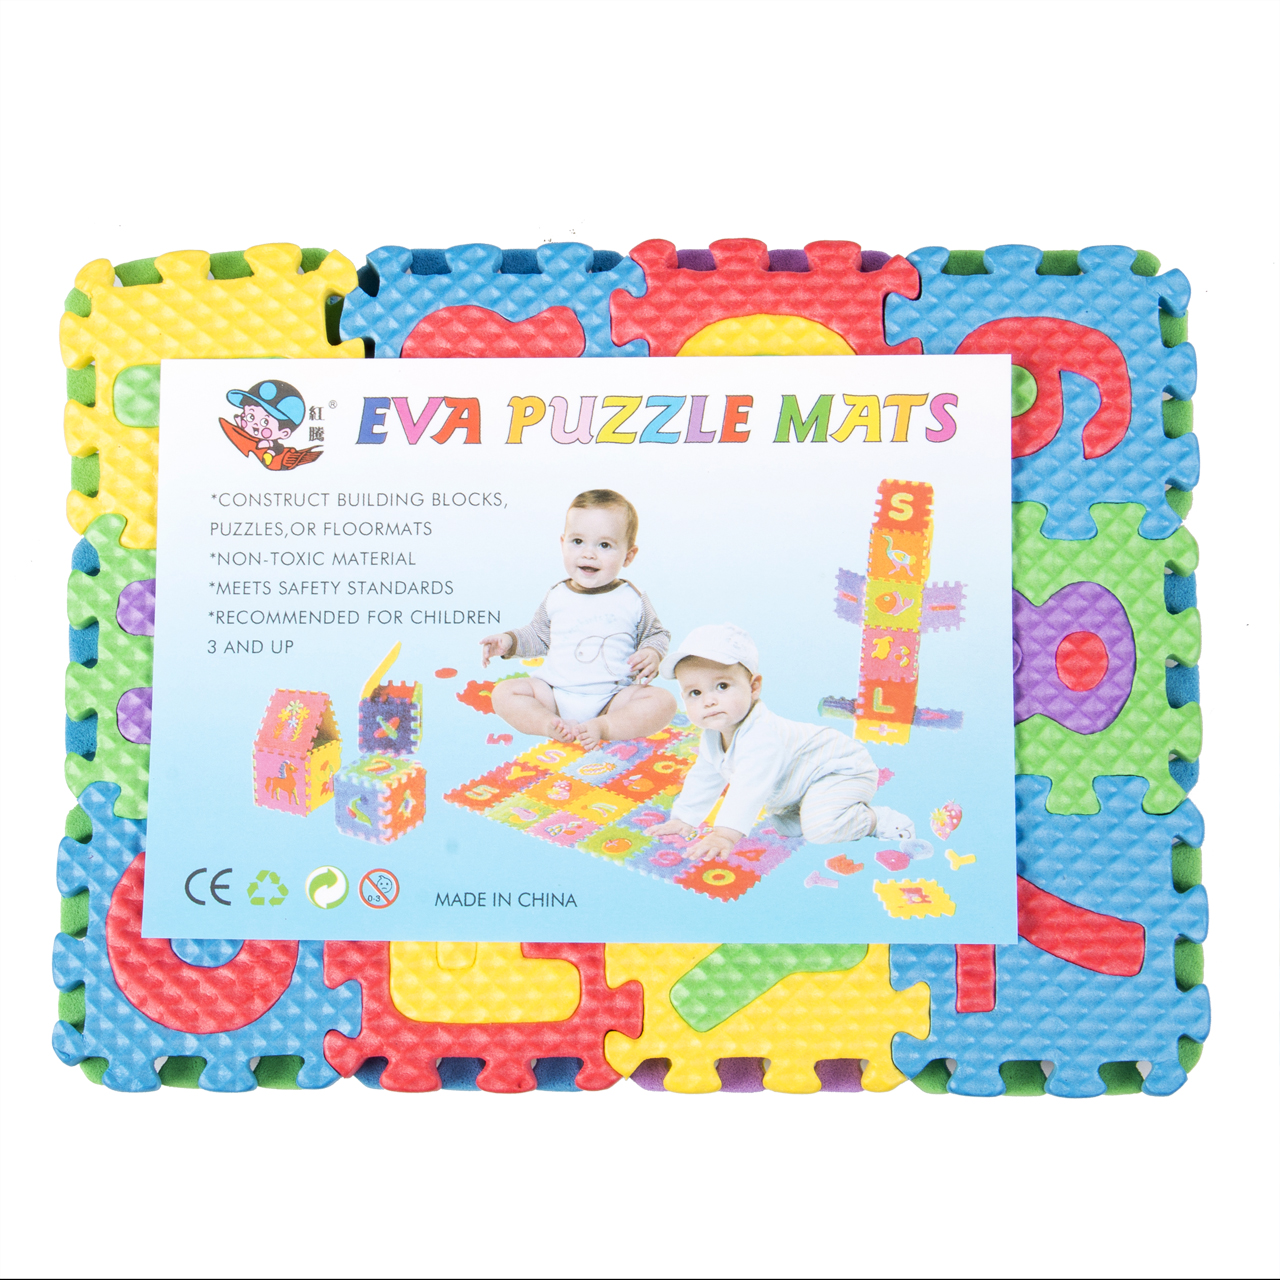 1cd9b4023a2 36pcs Soft Eva Foam Baby Play Floor Mat Alphabet Numbers Kids DIY ...